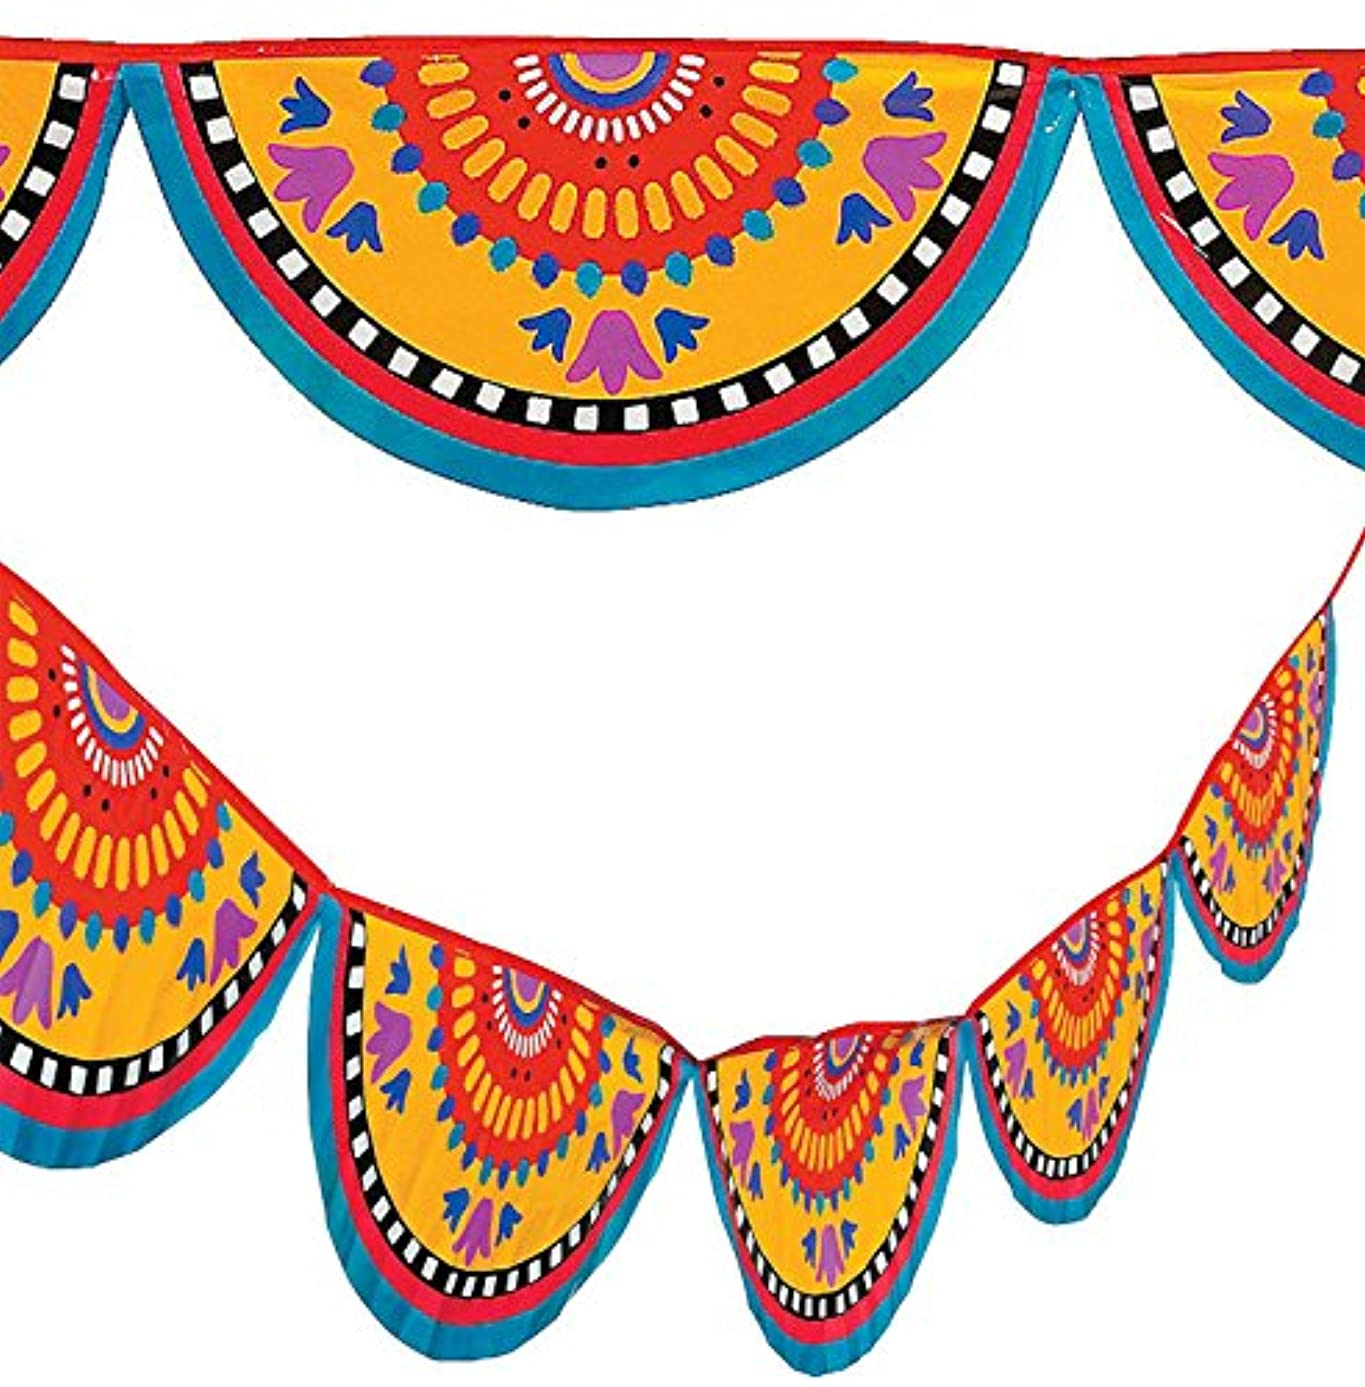 48 Ft Mexican Bunting Banner Cinco de Mayo Fiesta Party Garland Decor 2-24'